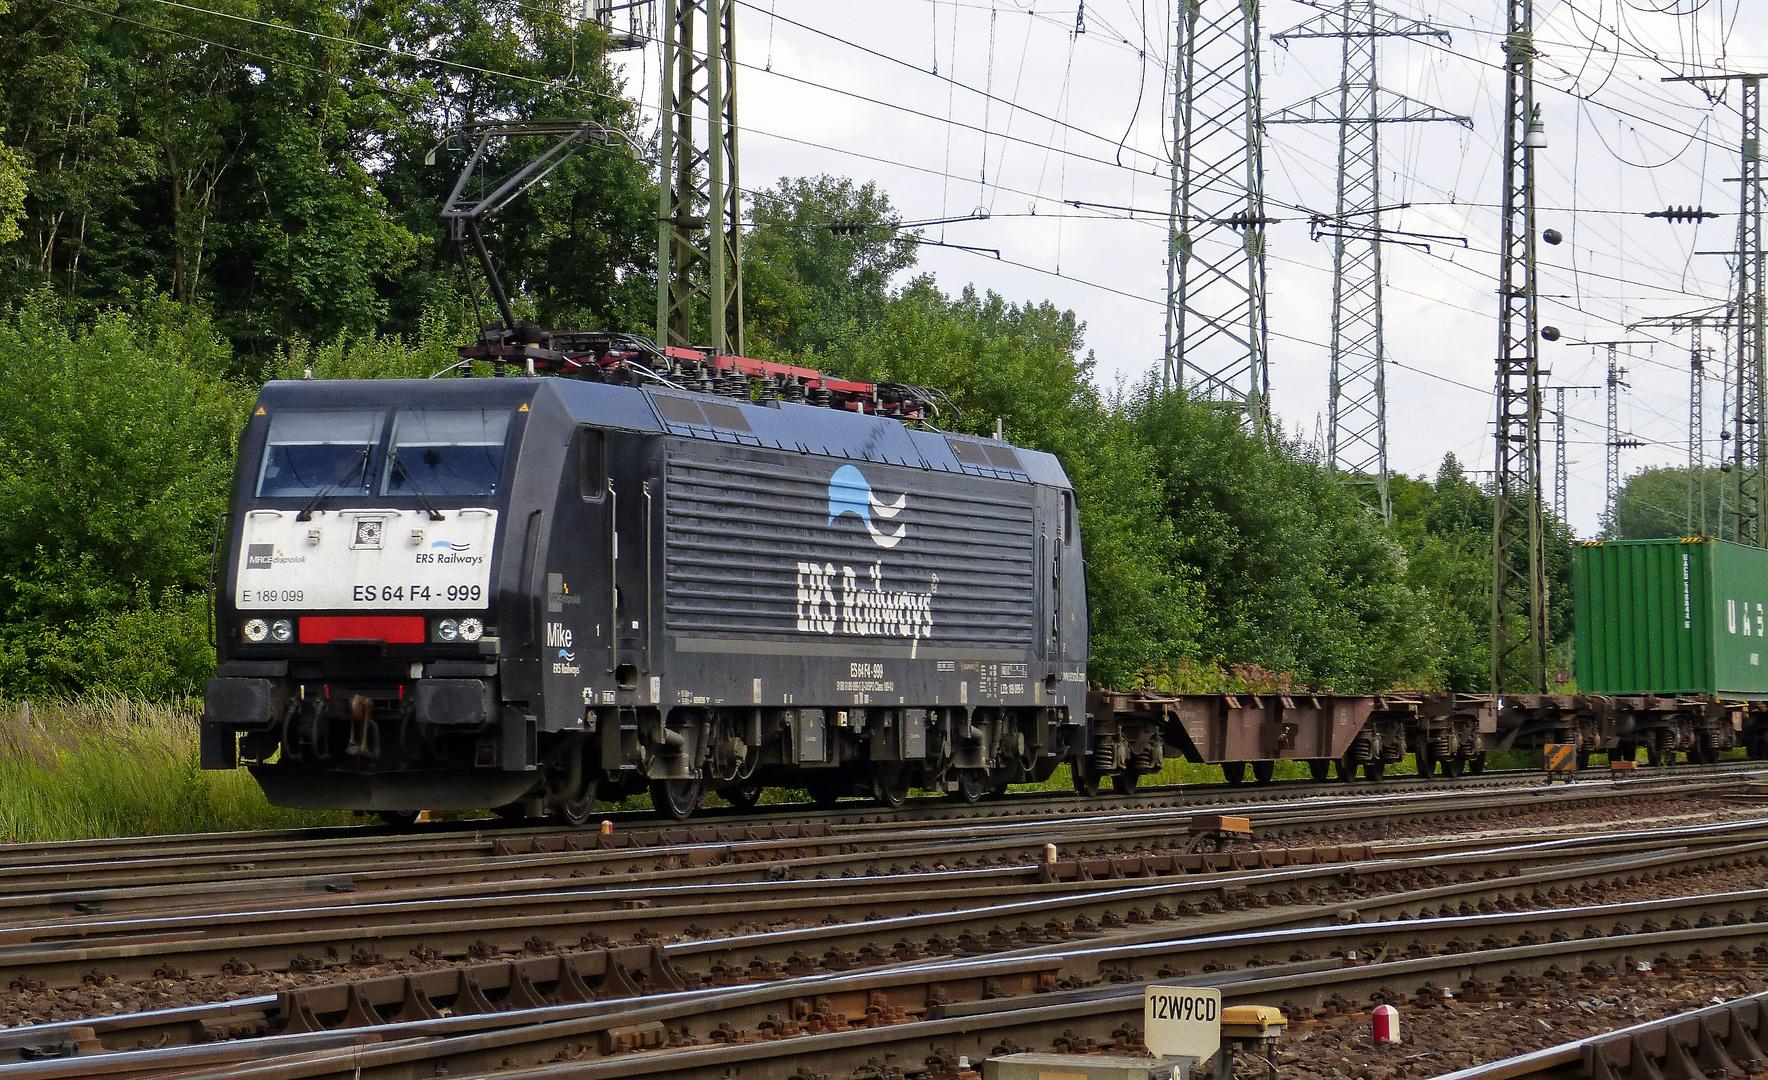 BR 189 099, ERS Railways